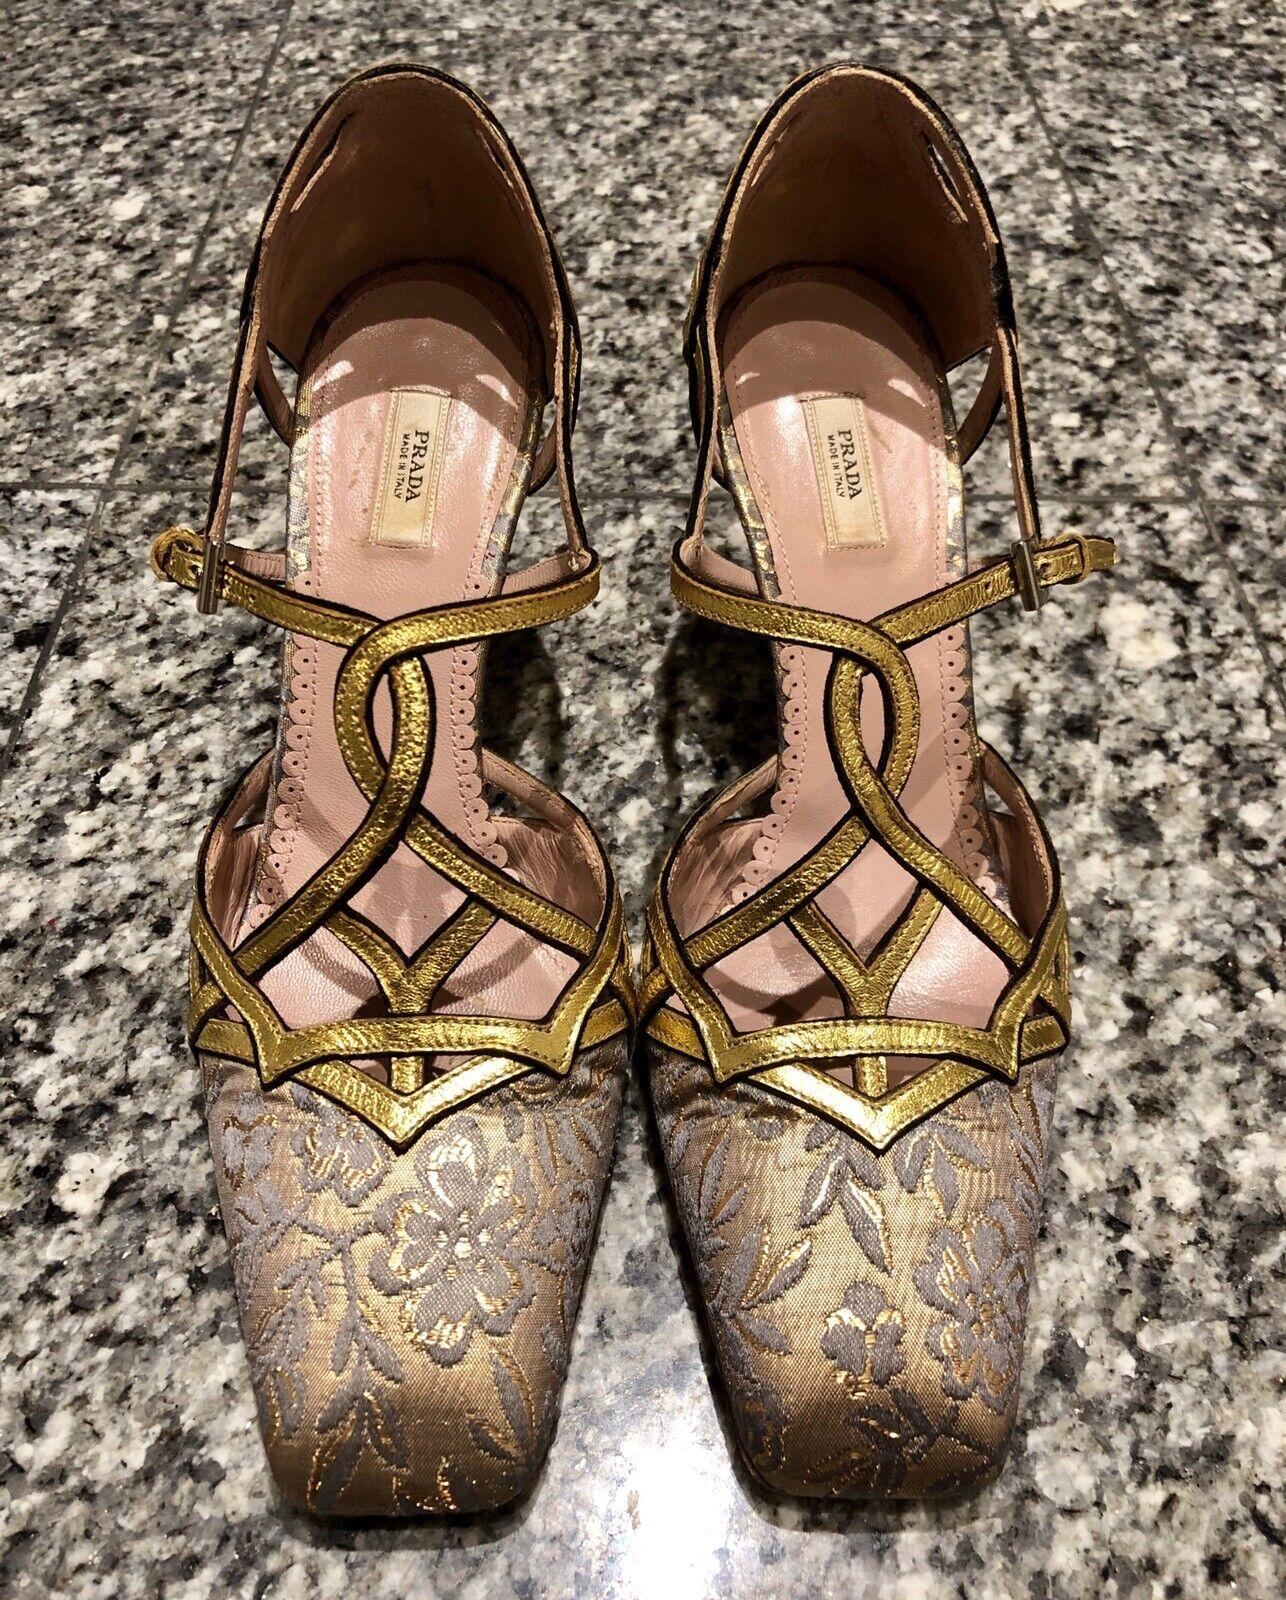 PRADA gold Brocade Satin Heels